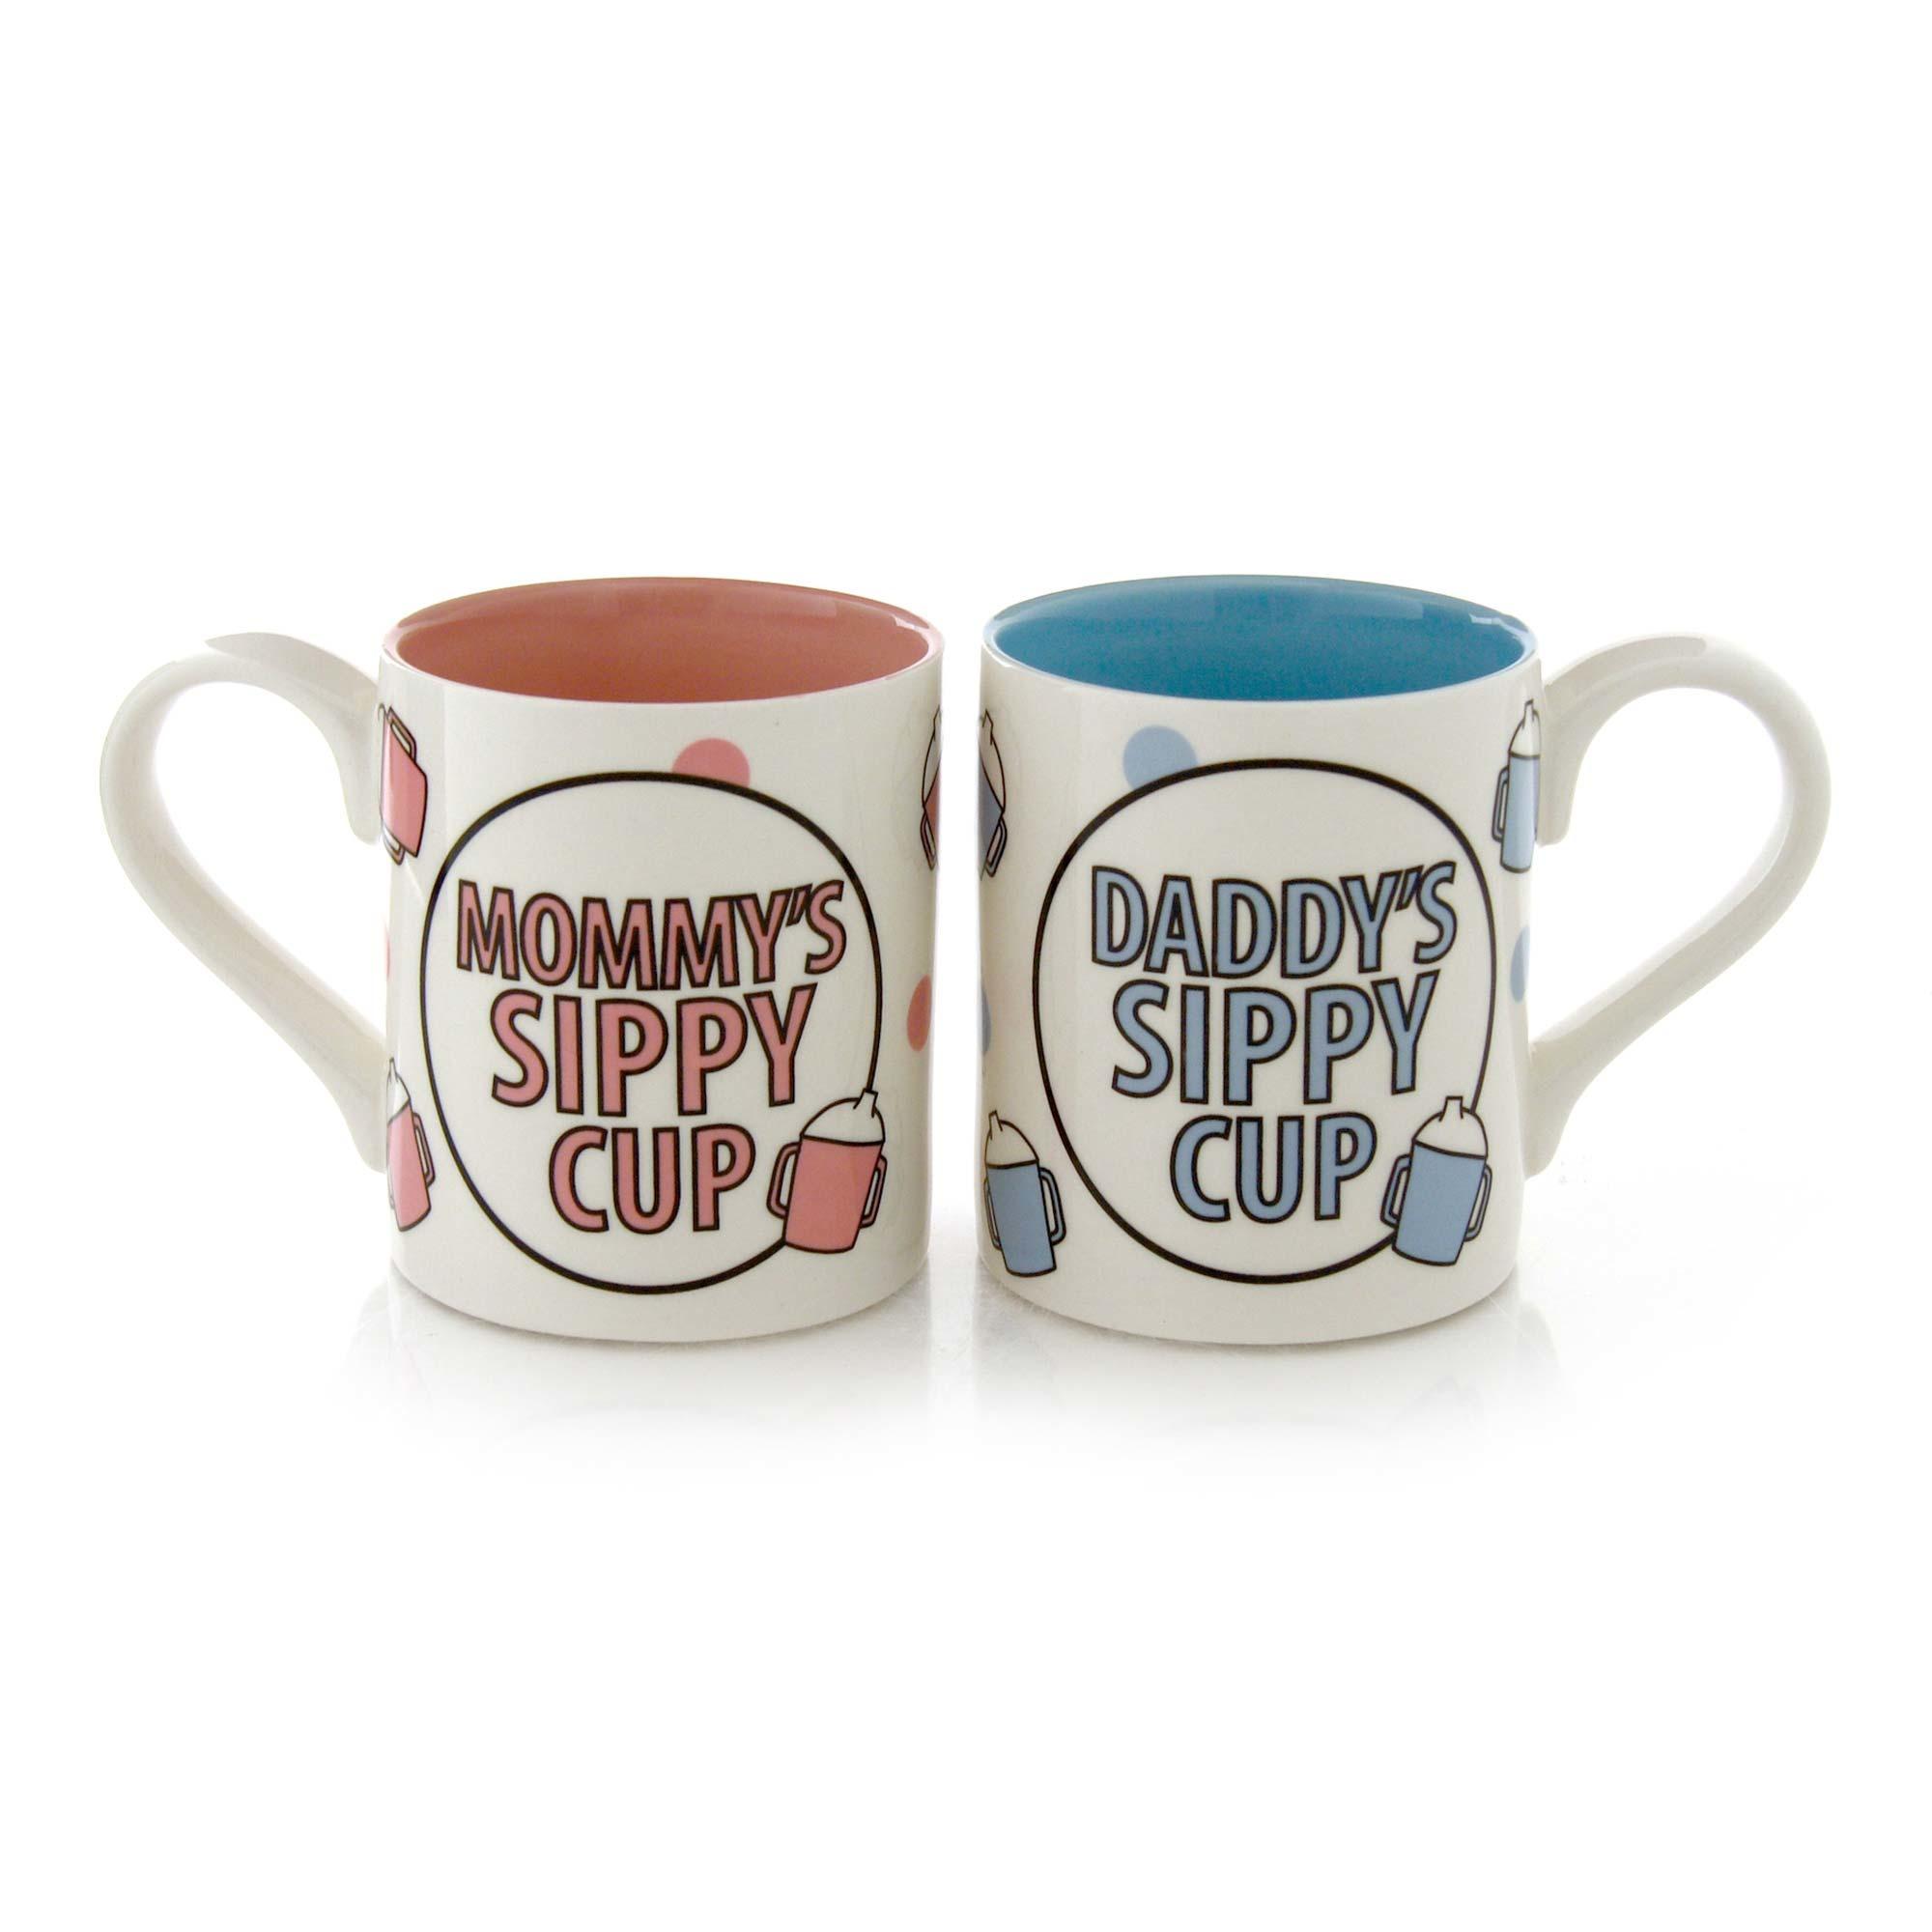 Sippy Cup Mug Set